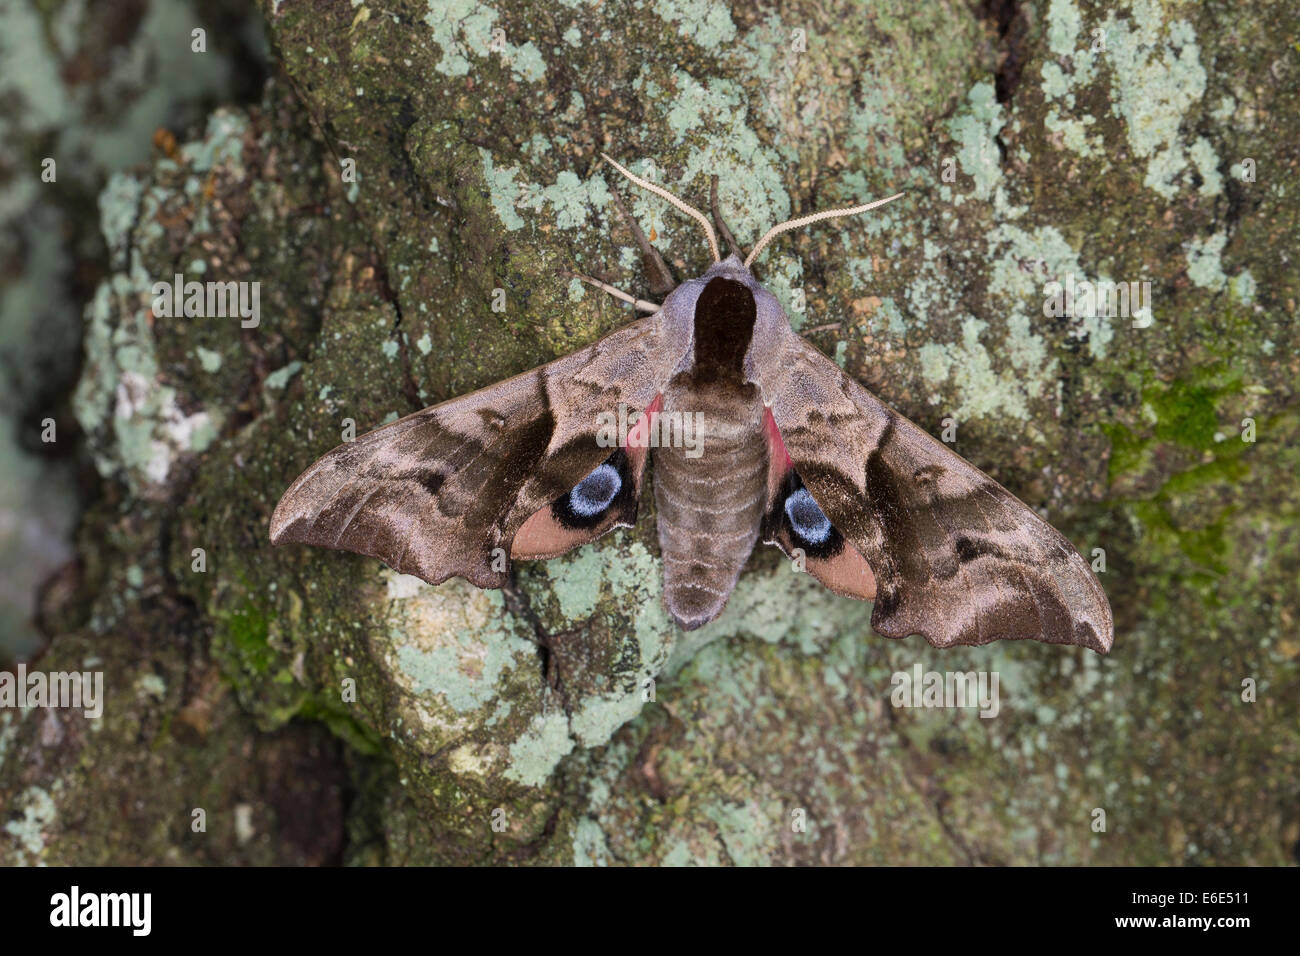 Eyed Hawk-Moth, Eyed Hawkmoth, Abendpfauenauge, Abend-Pfauenauge, Smerinthus ocellata, Smerinthus ocellatus, Schwärmer - Stock Image